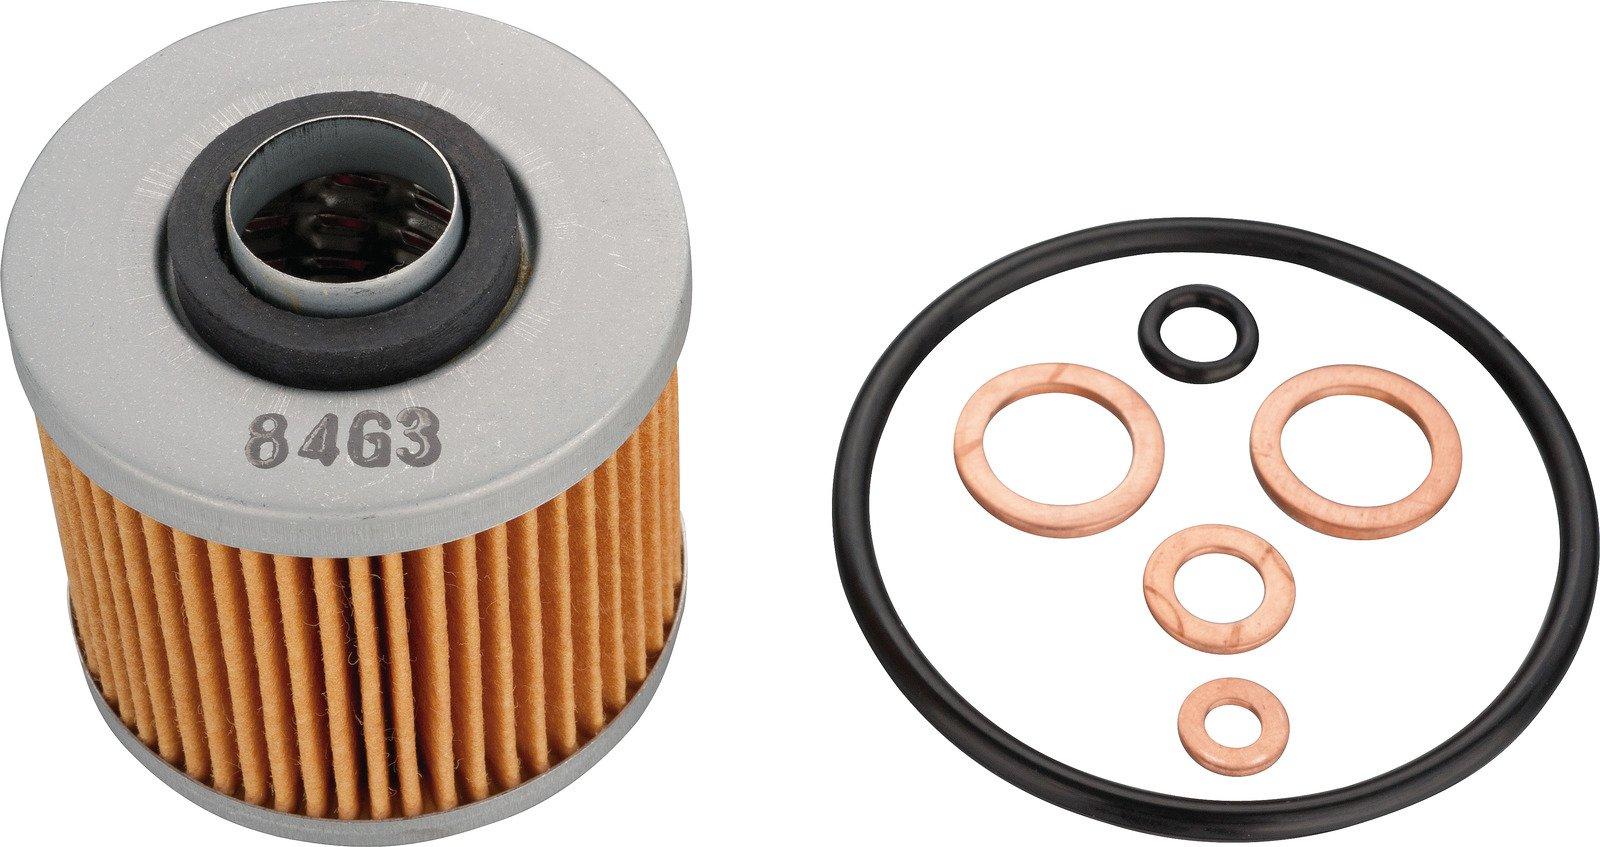 Yamaha Sr400 Sr500 Xt500 Tt500 Oil Filter Kit 7 Pieces